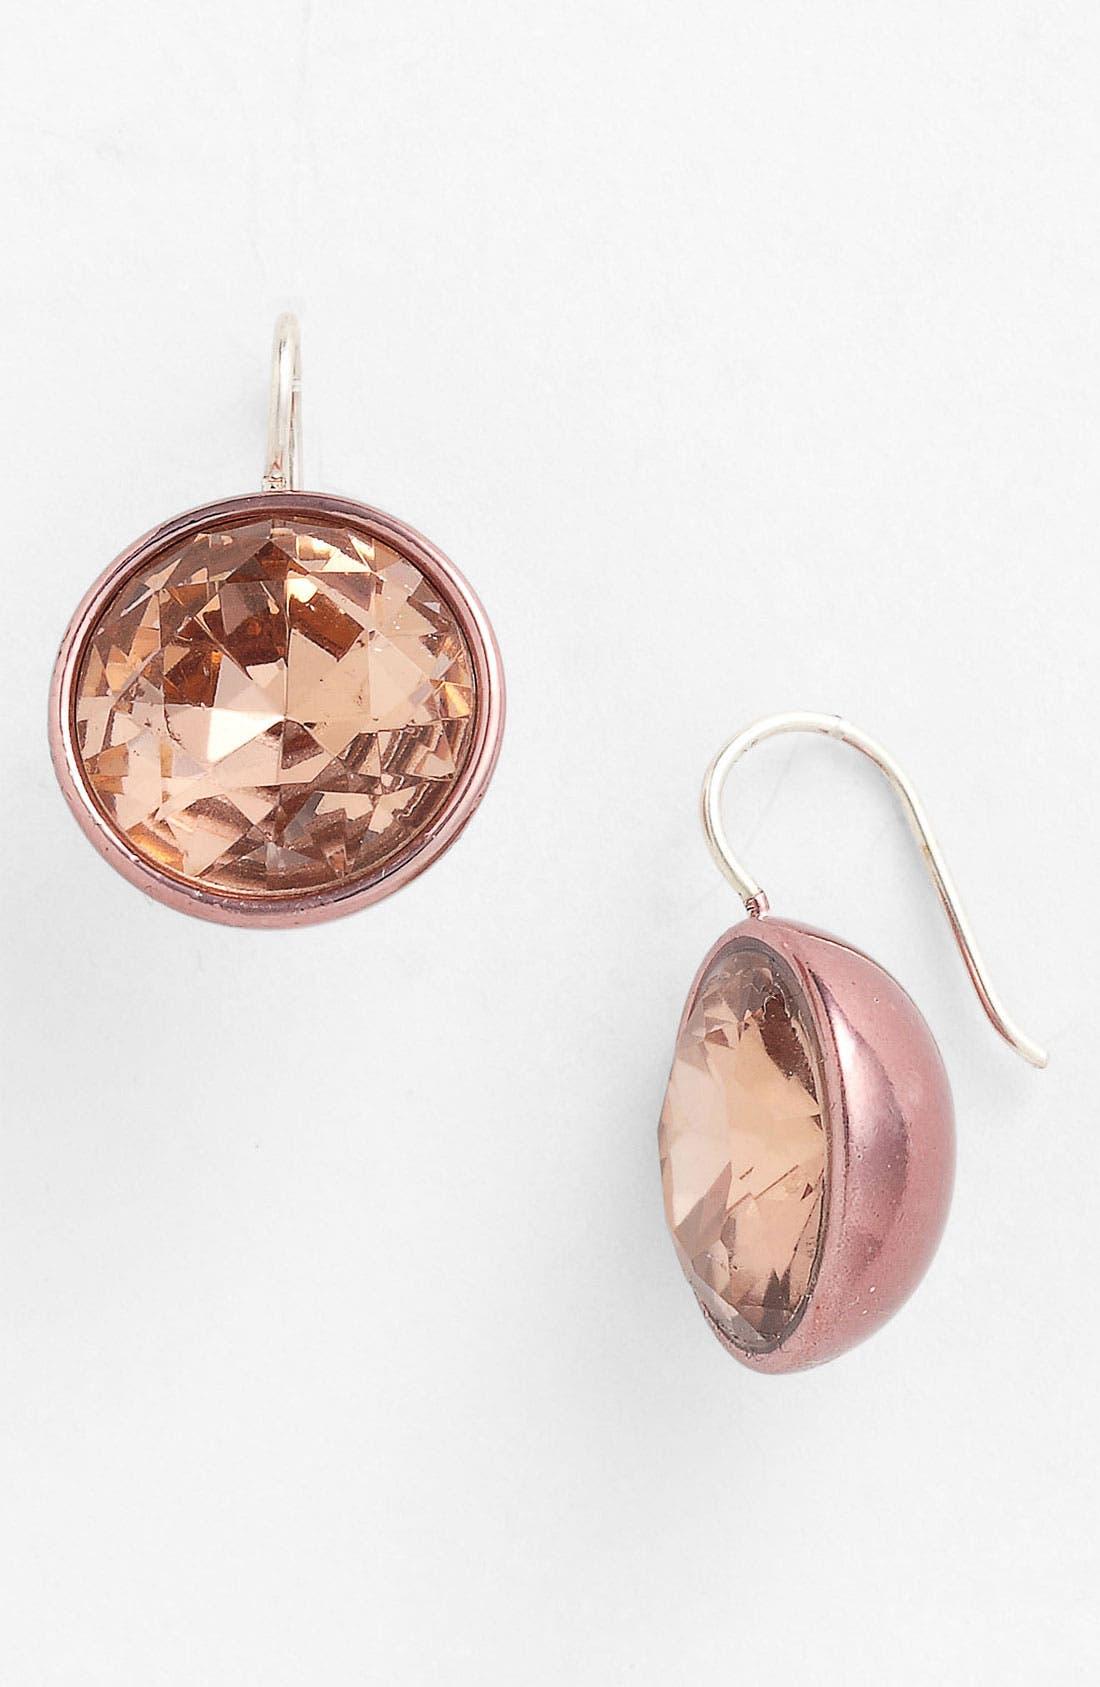 Main Image - Juicy Couture 'Glam Rocks' Drop Earrings